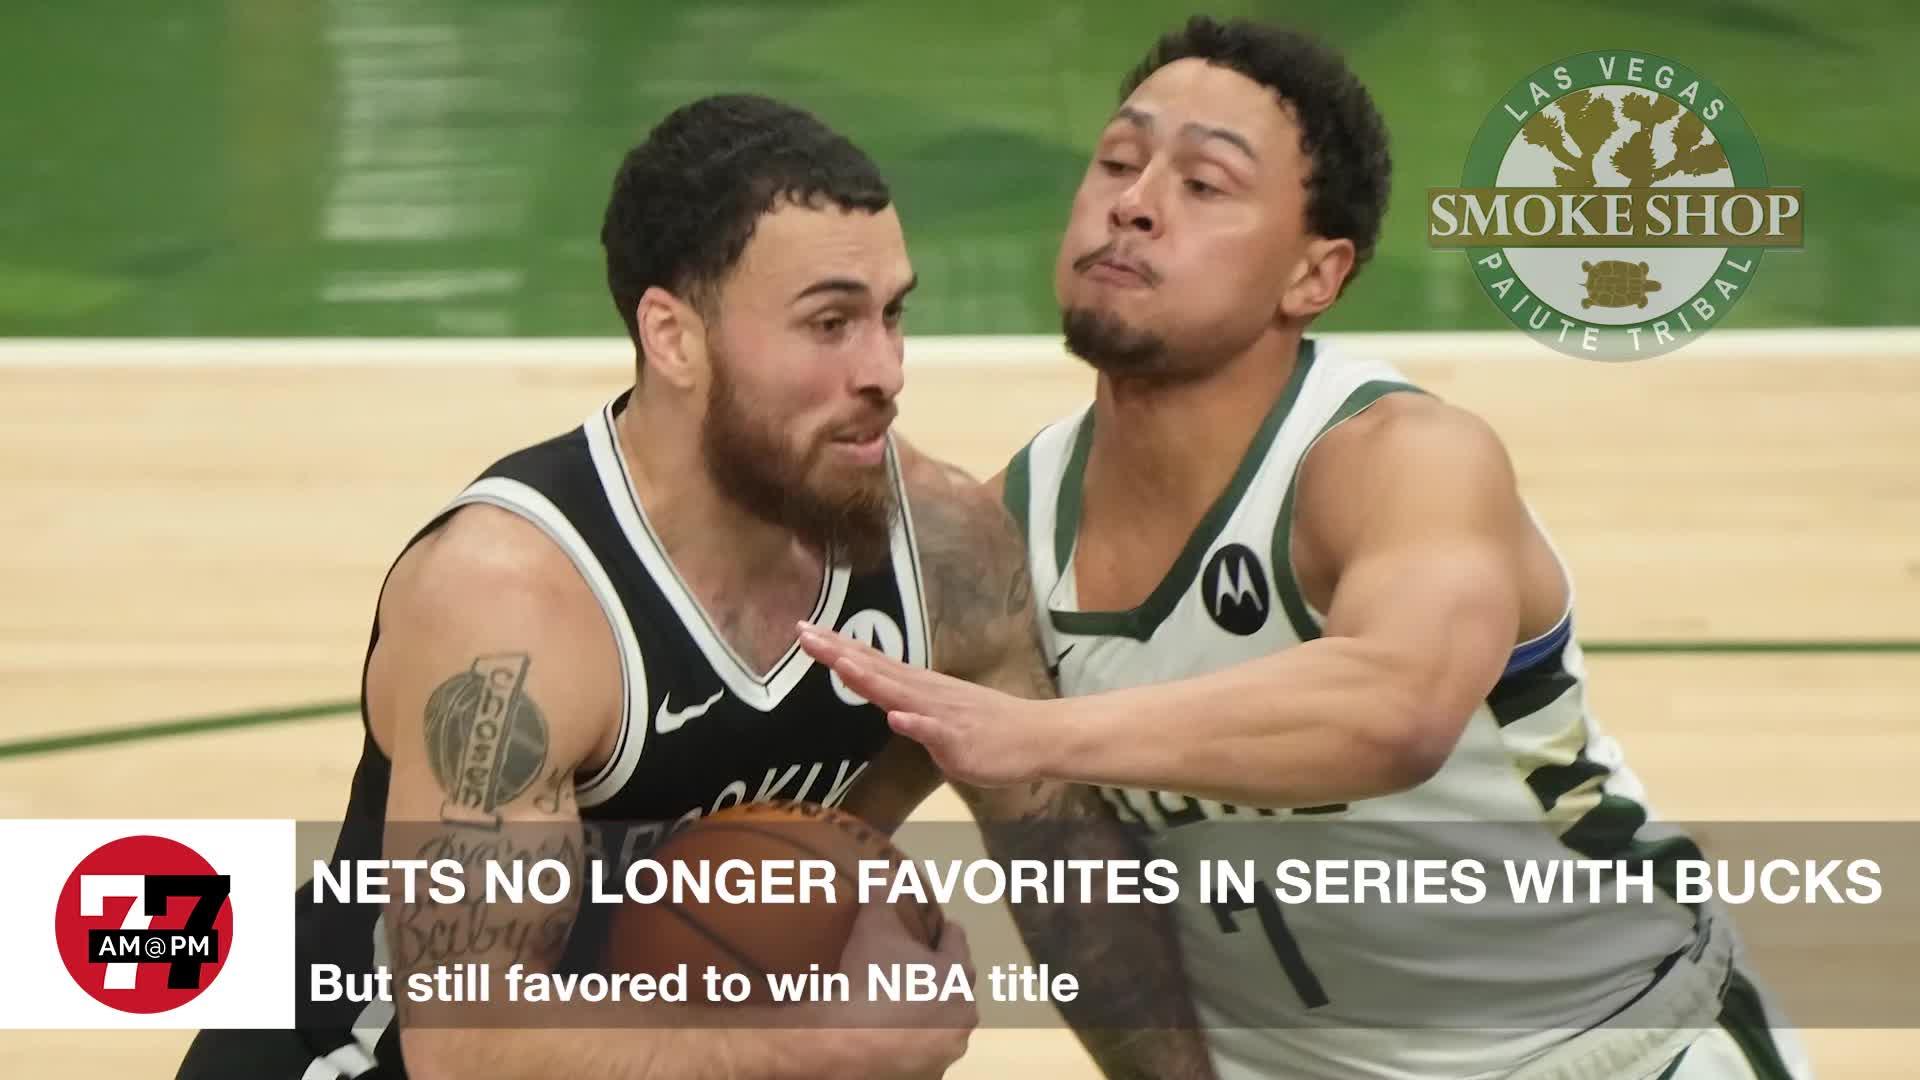 7@7PM Nets No Longer Favored